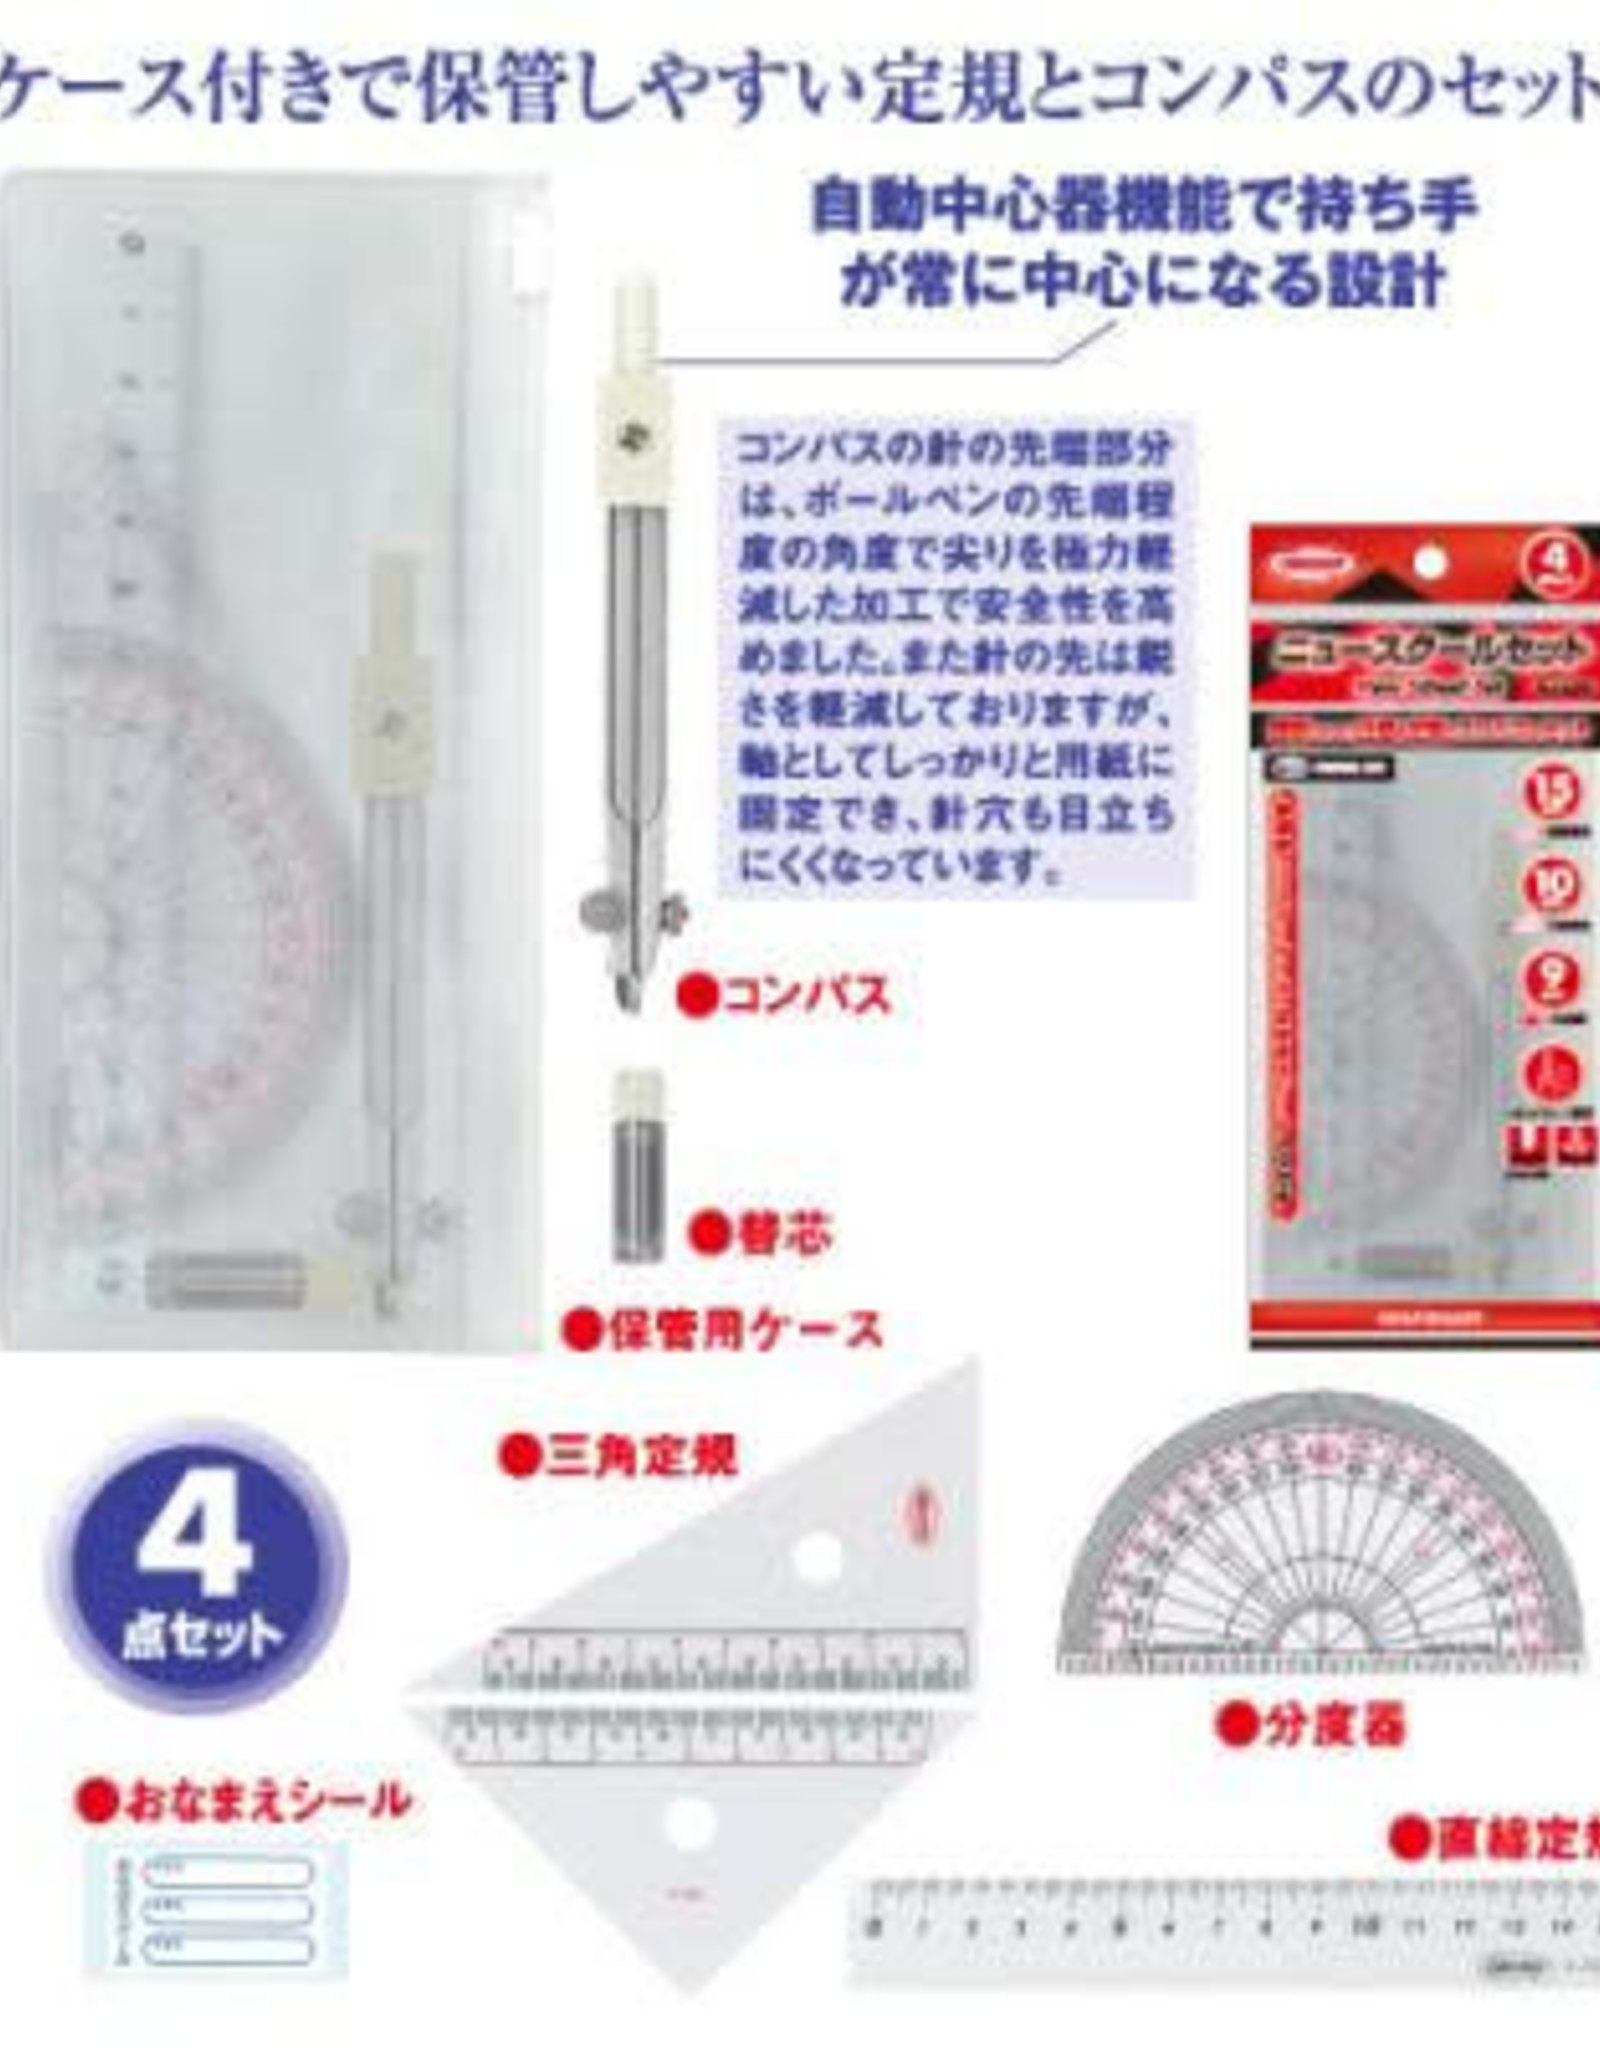 Kyoei Plastic School Set (Ruler, Protractor, Compass, Triangle)